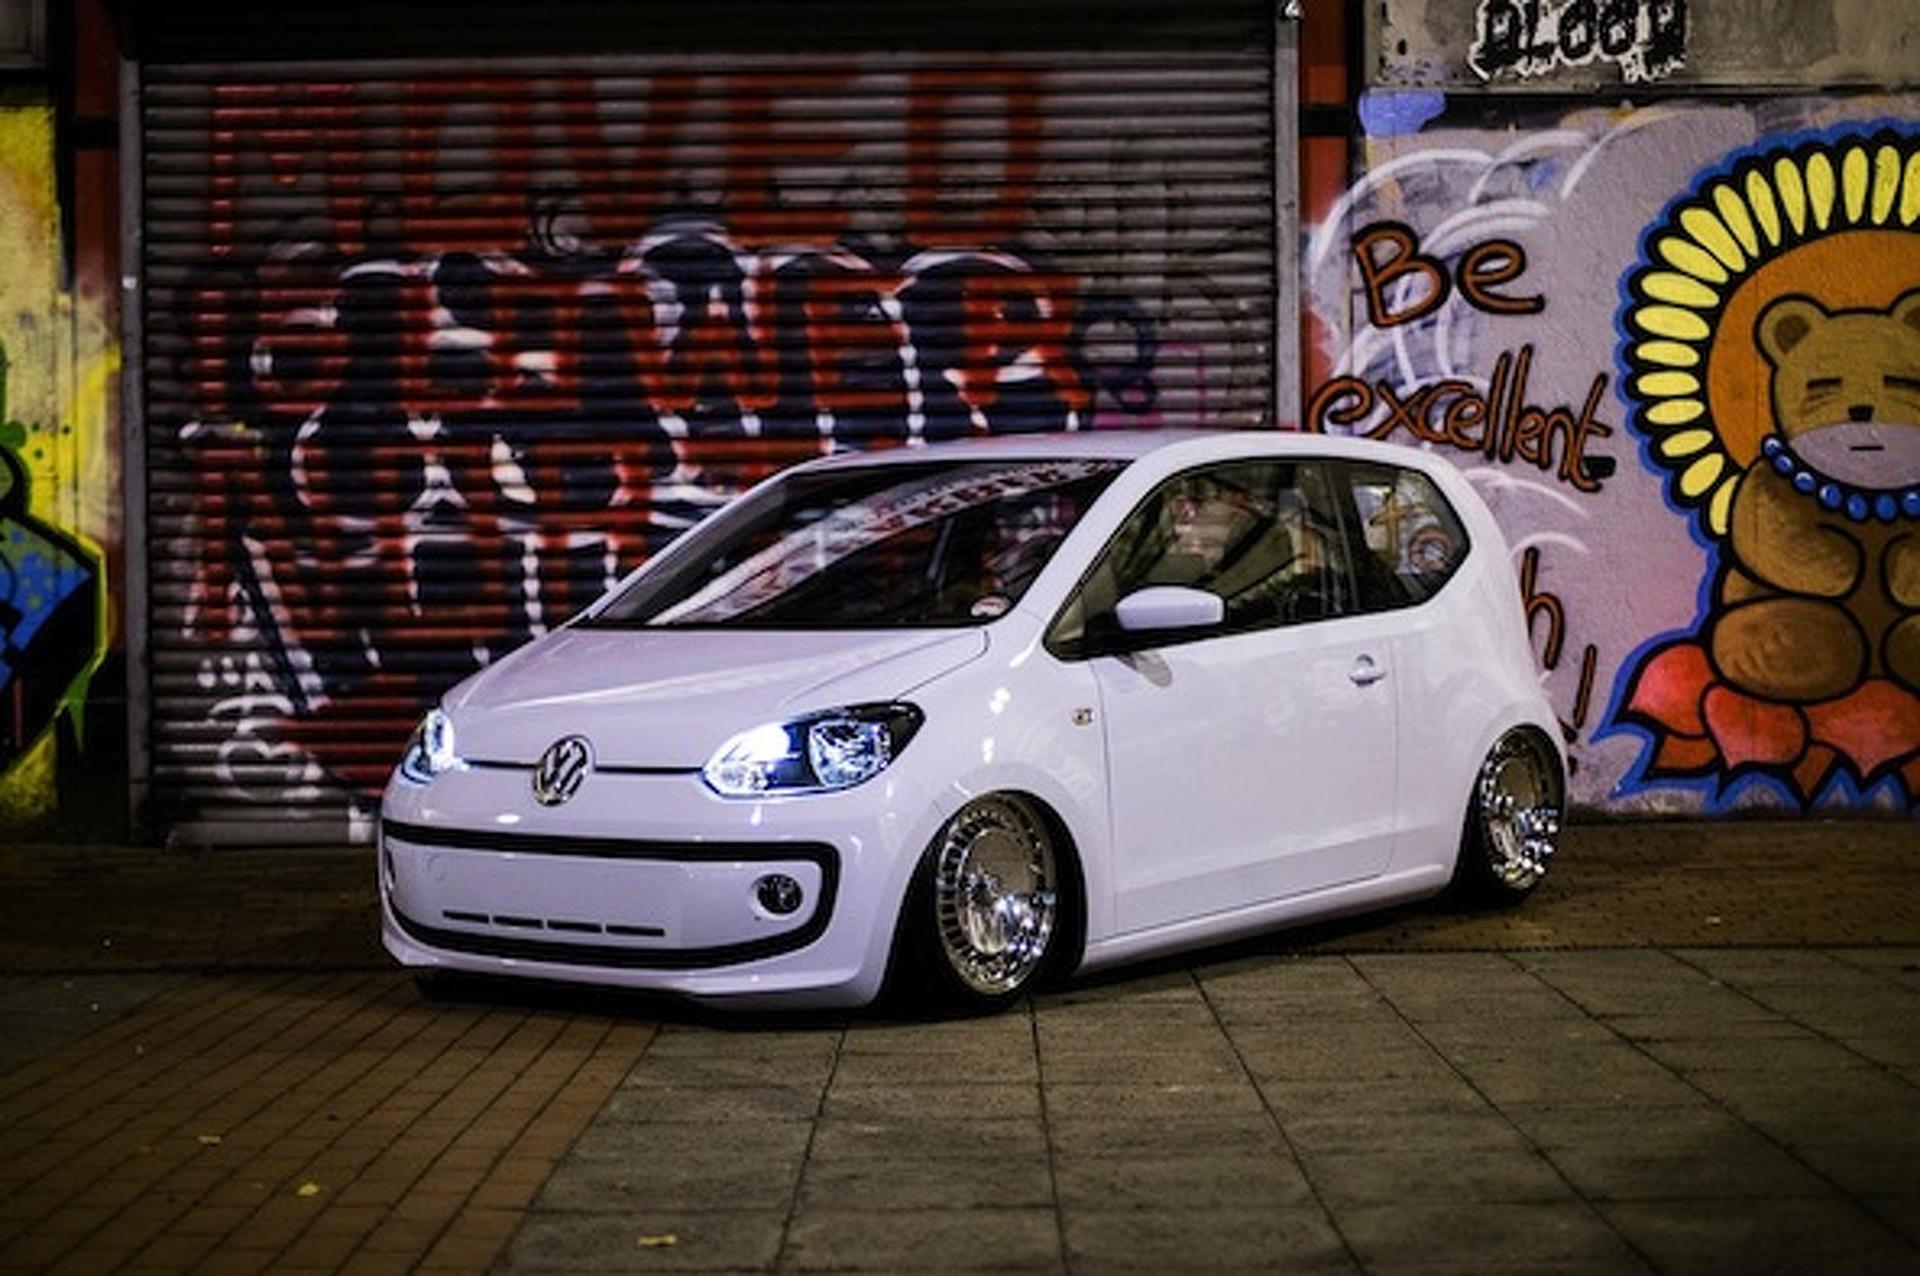 VW Up! Gets the Slammed Treatment